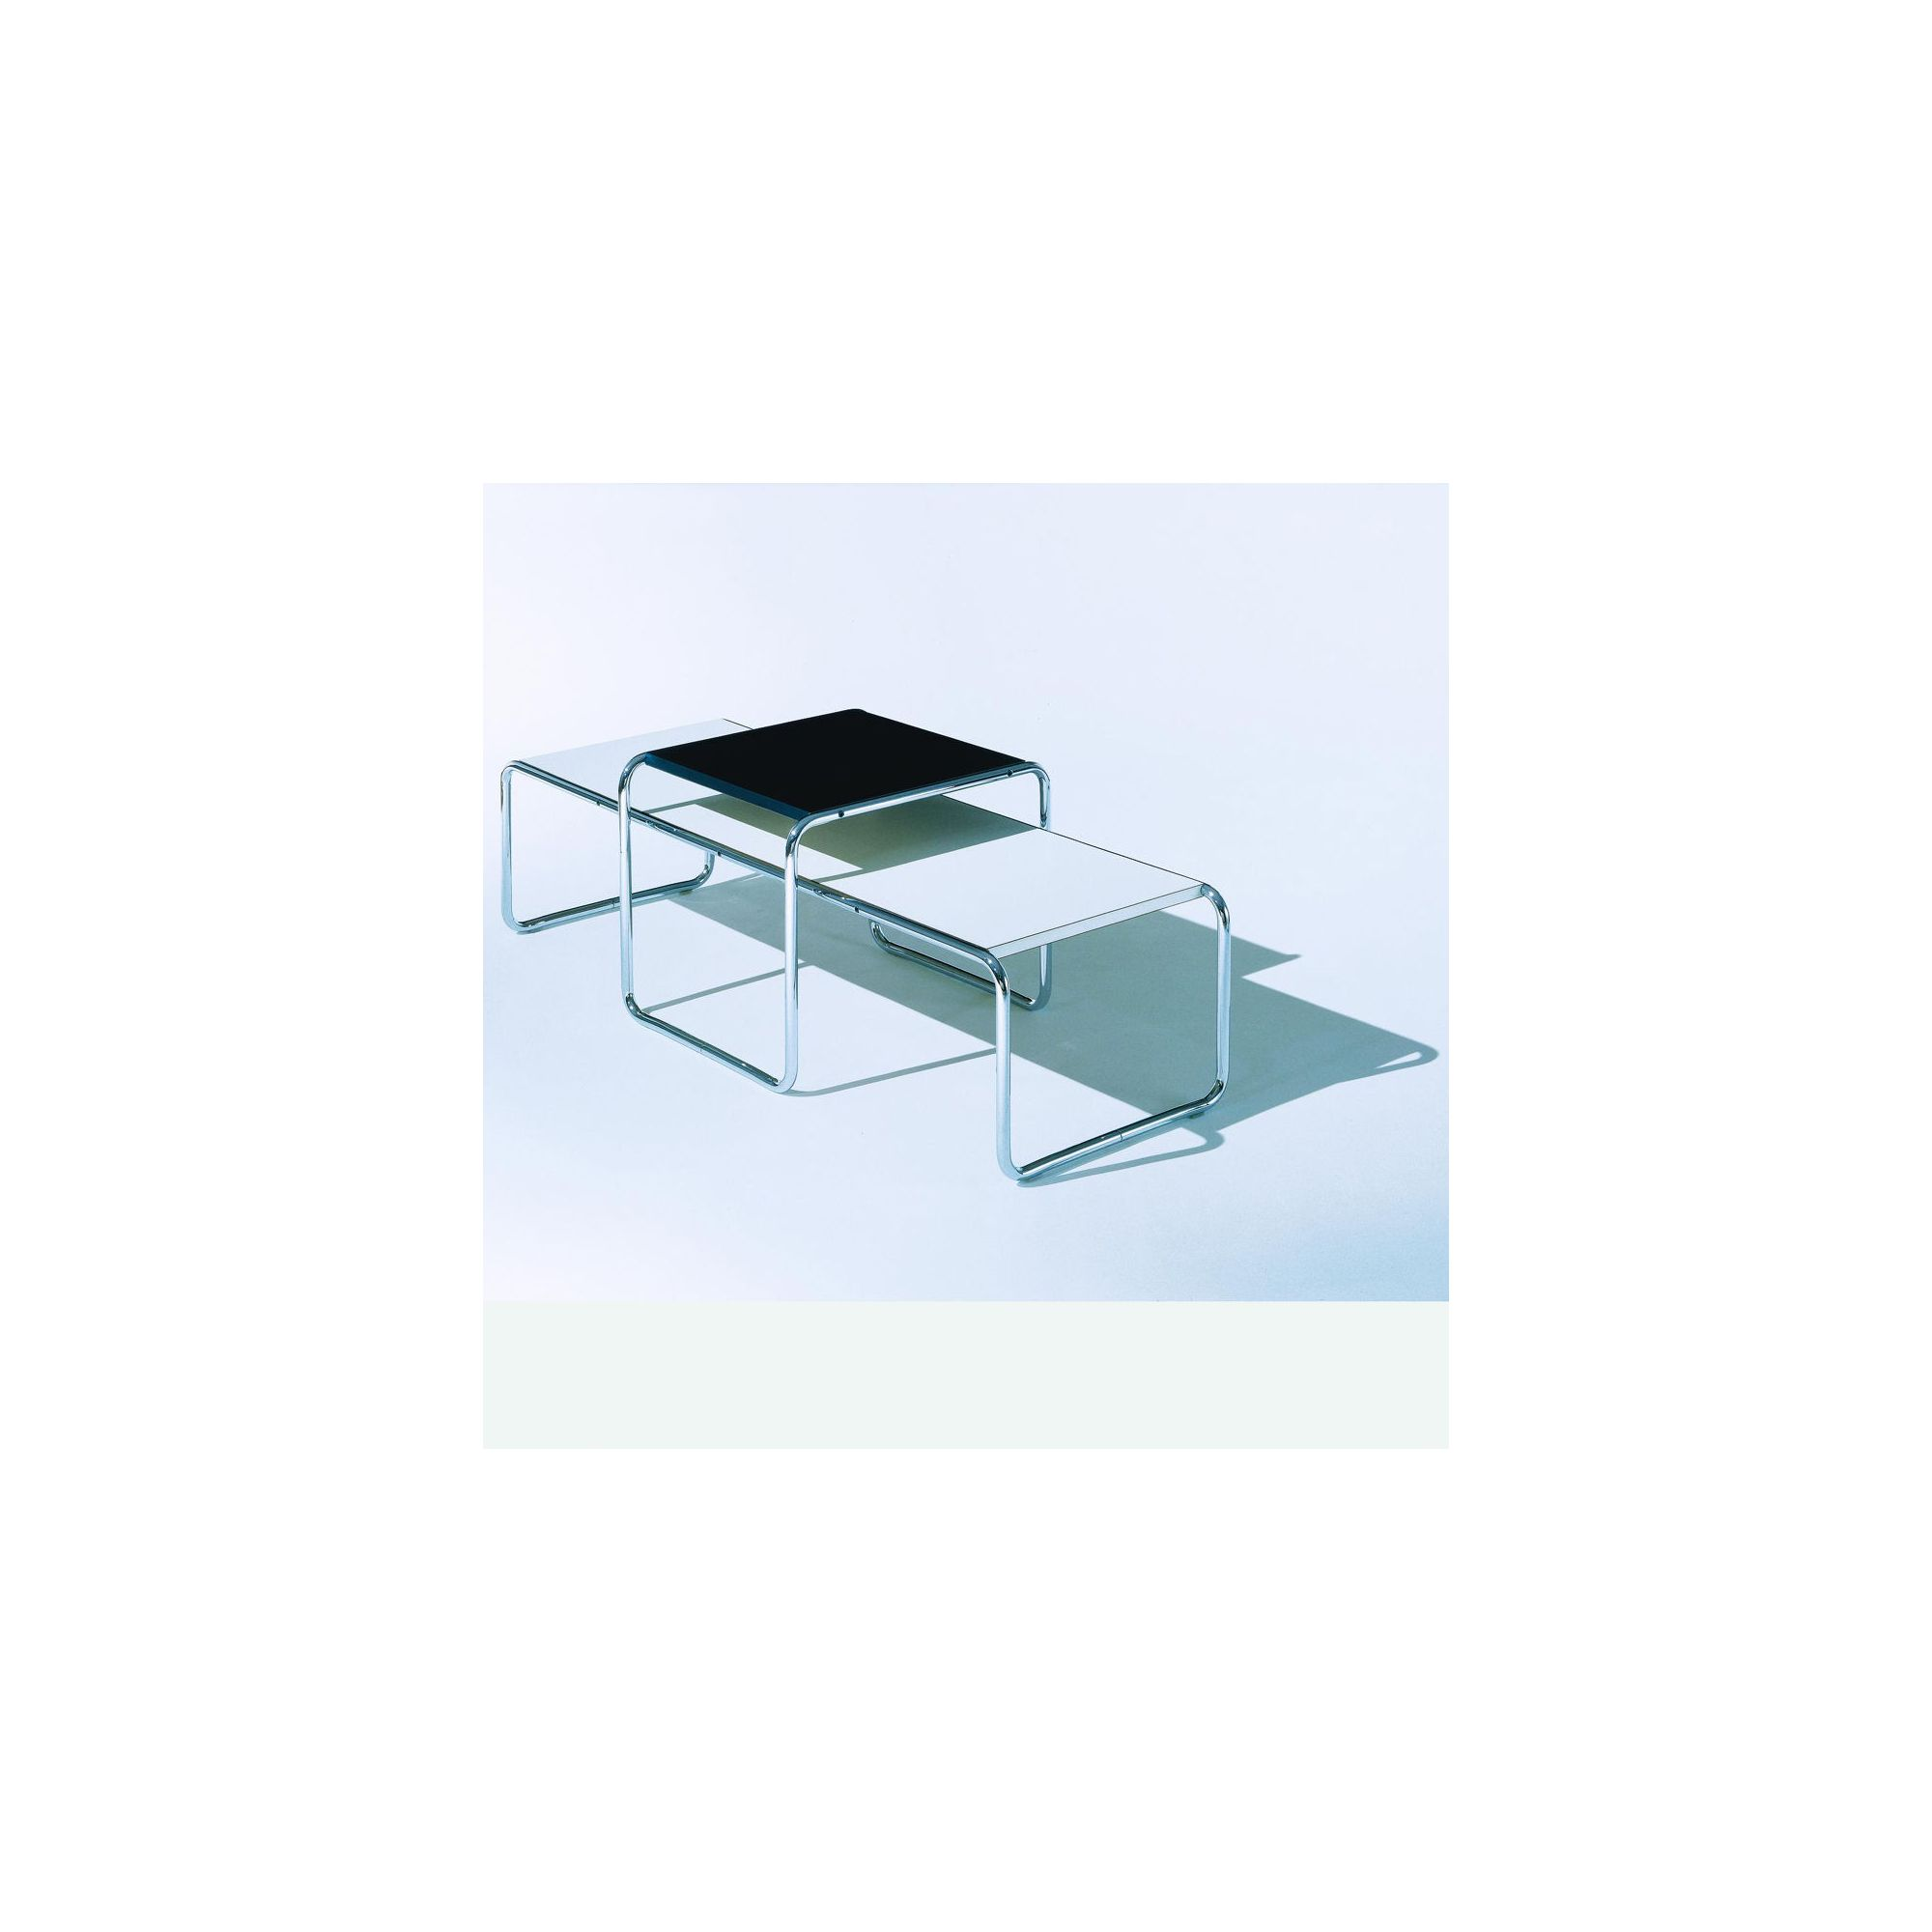 Knoll Laccio Square Table by Breuer - Quick Ship! - White at Tesco Direct